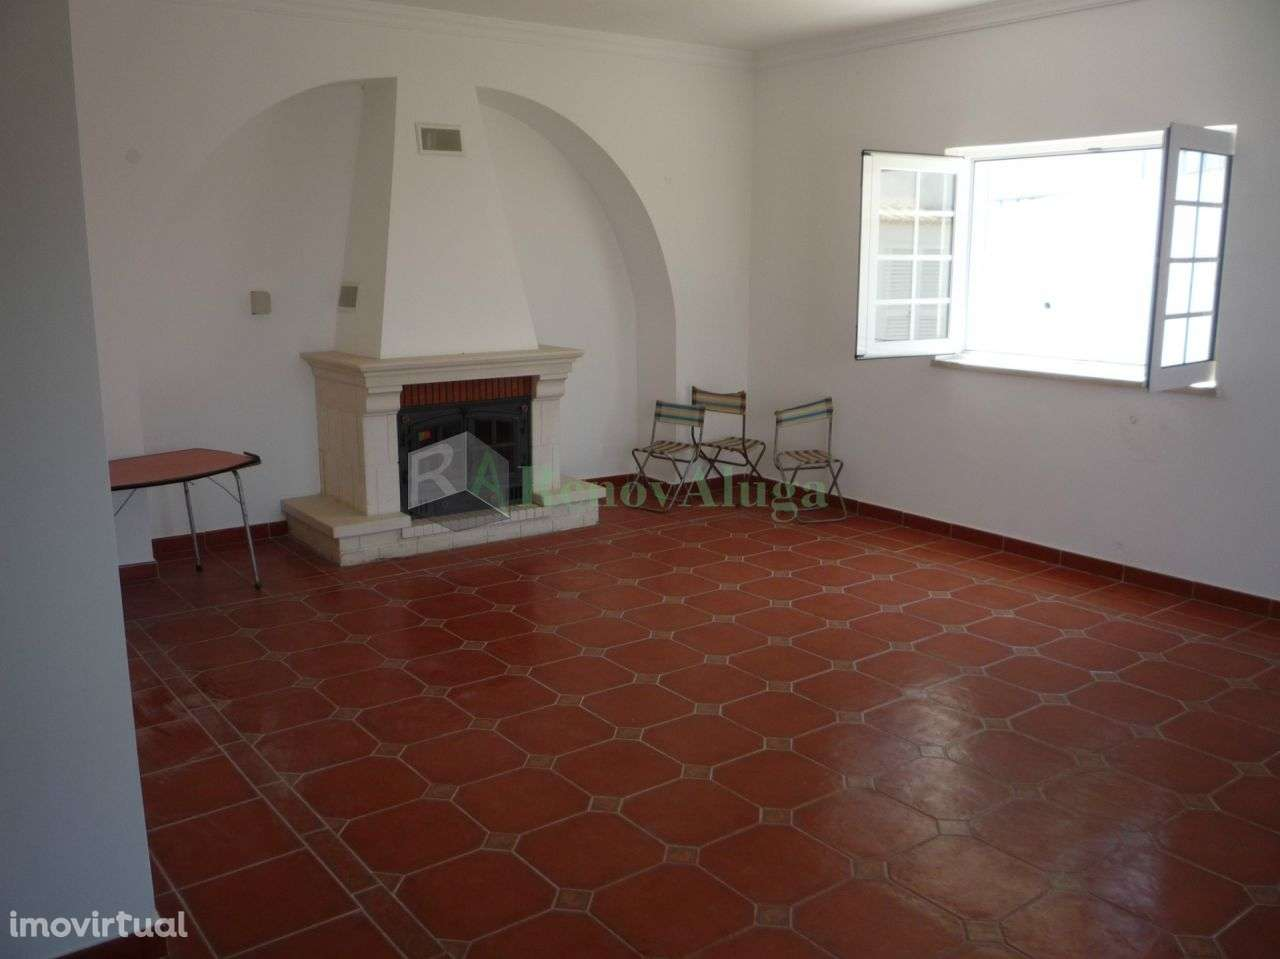 Moradia para arrendar, Quinta do Anjo, Setúbal - Foto 5